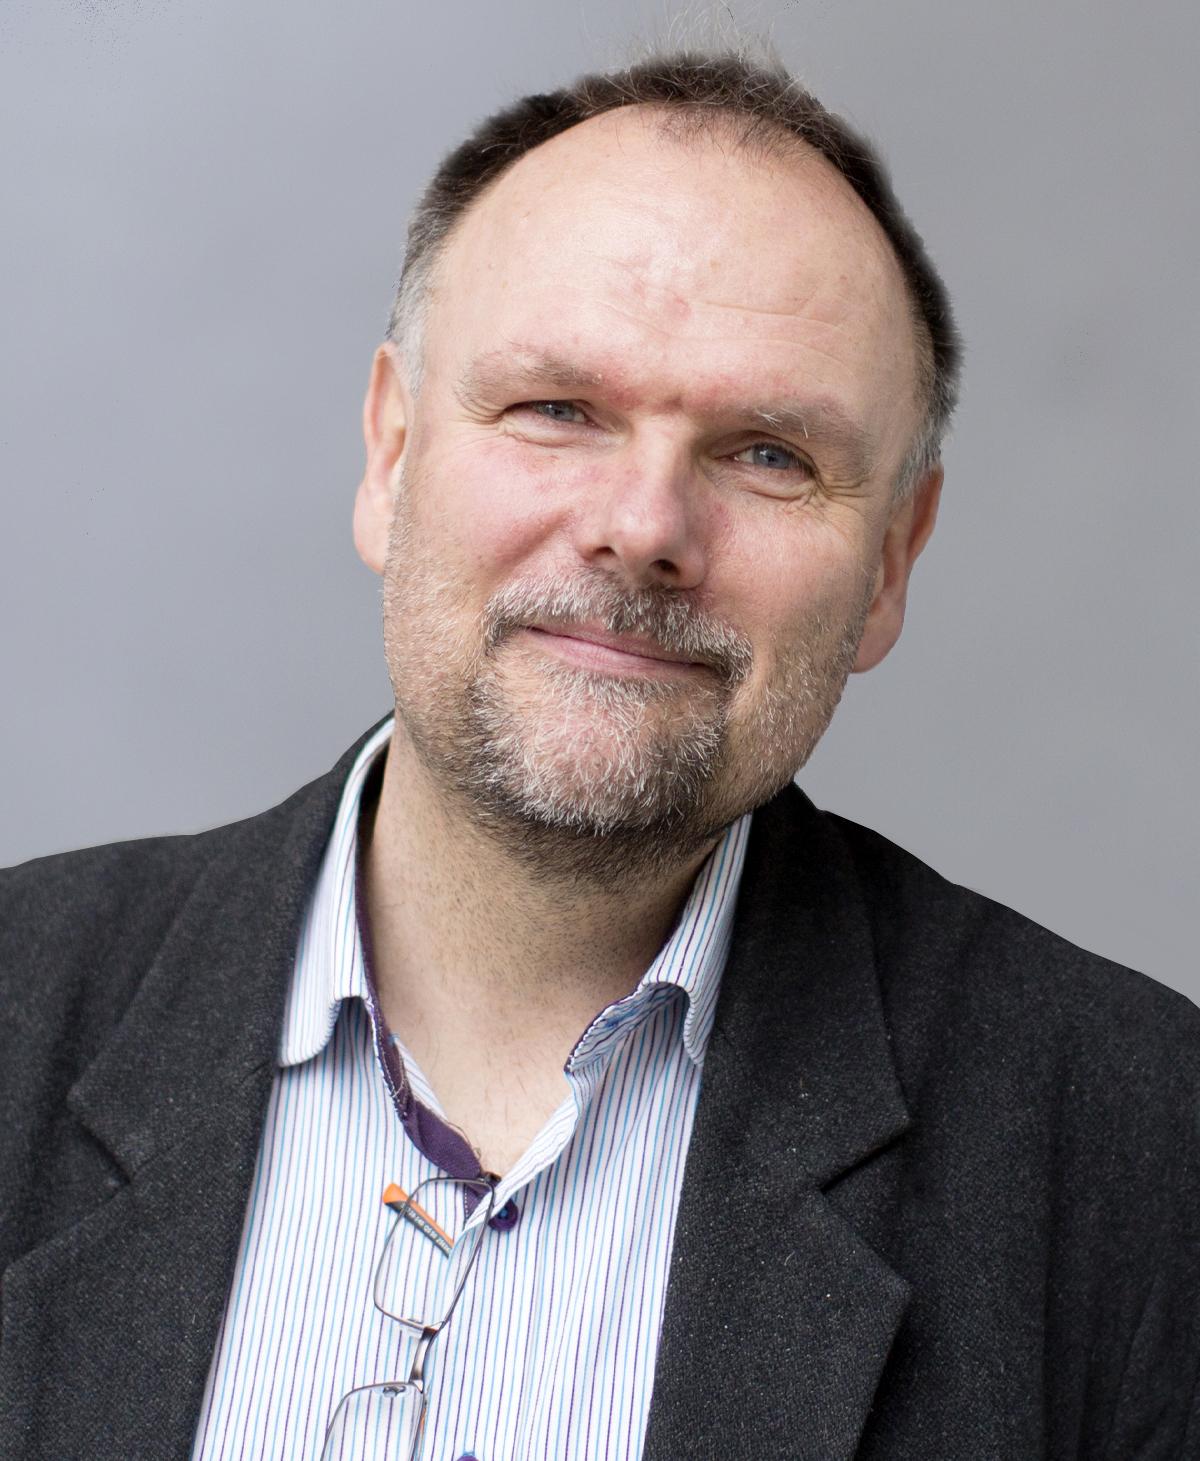 Board of directors Lipum - Dr Kristian Sandberg